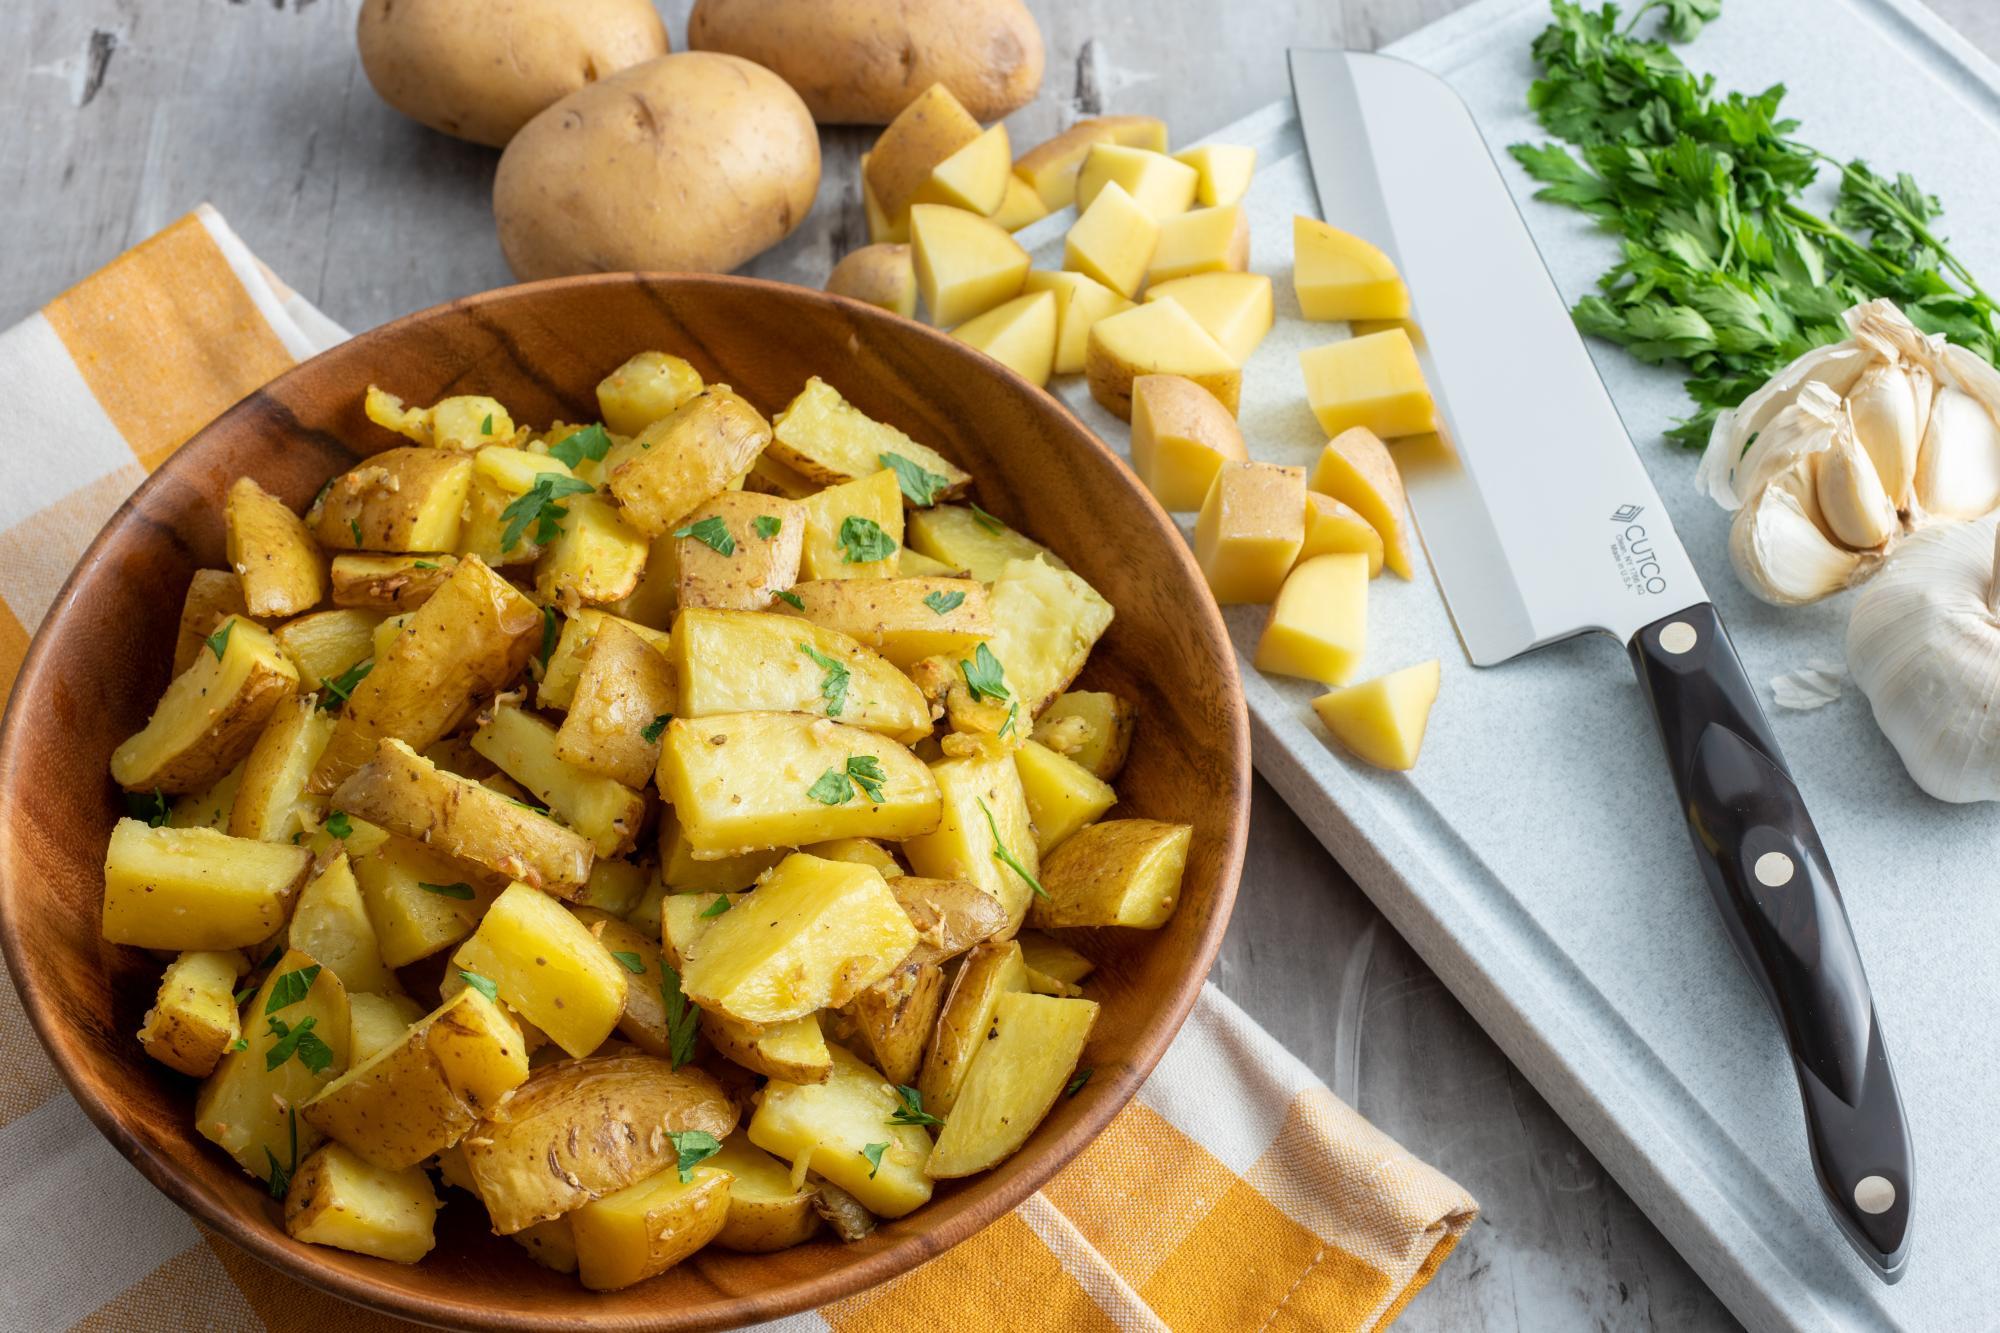 Easy Side of Garlic Roasted Potatoes